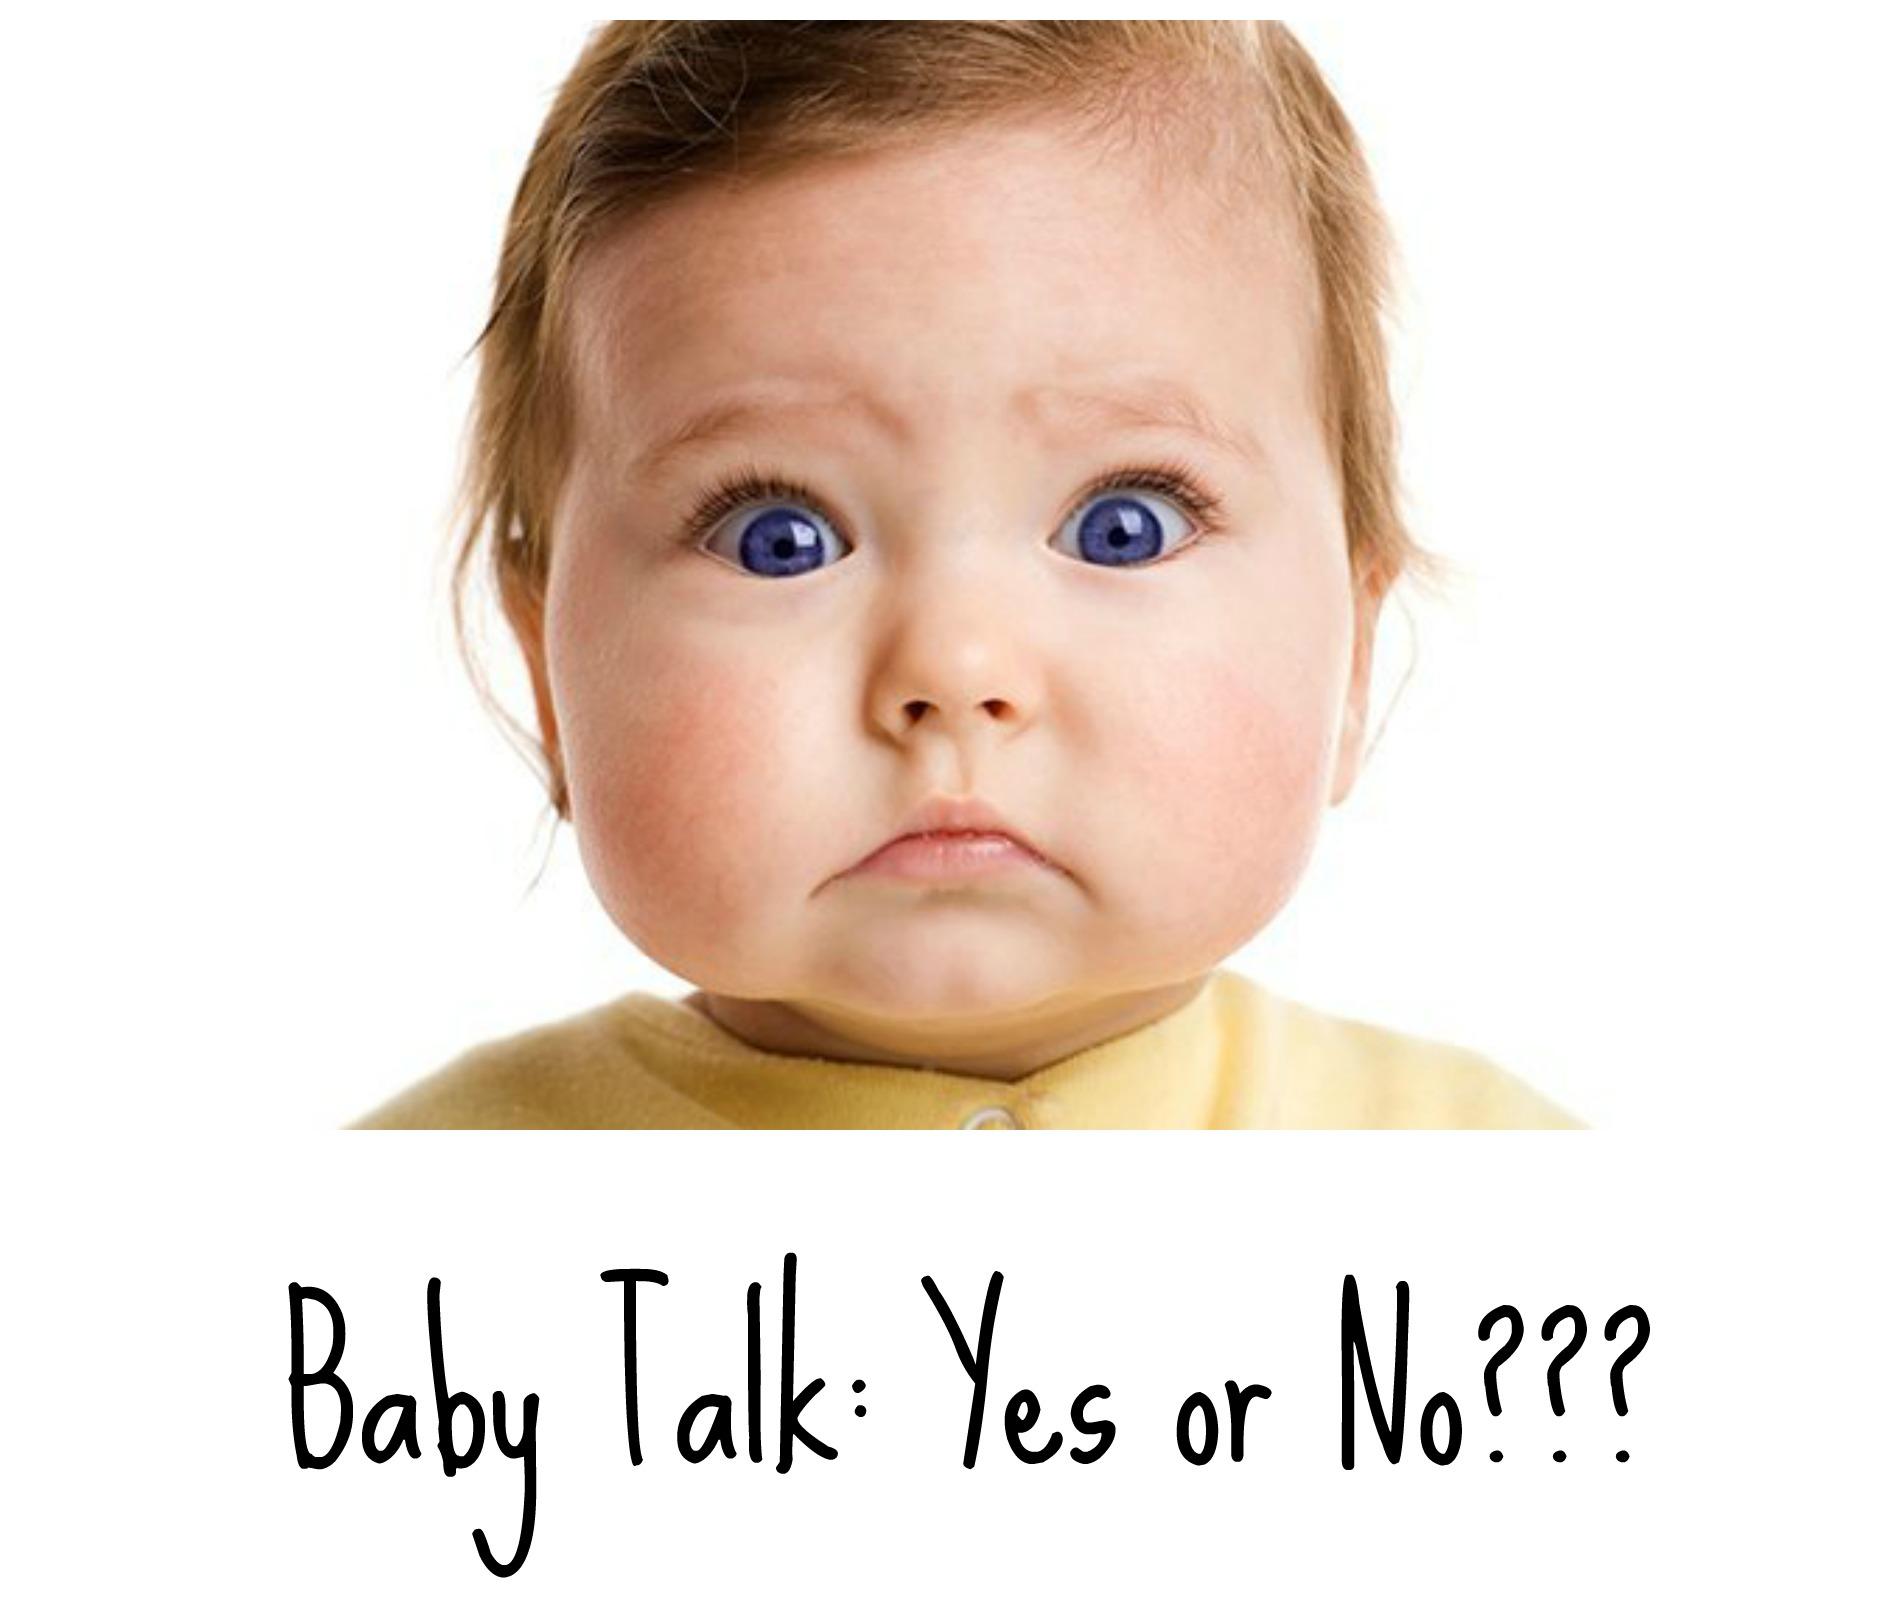 baby talk